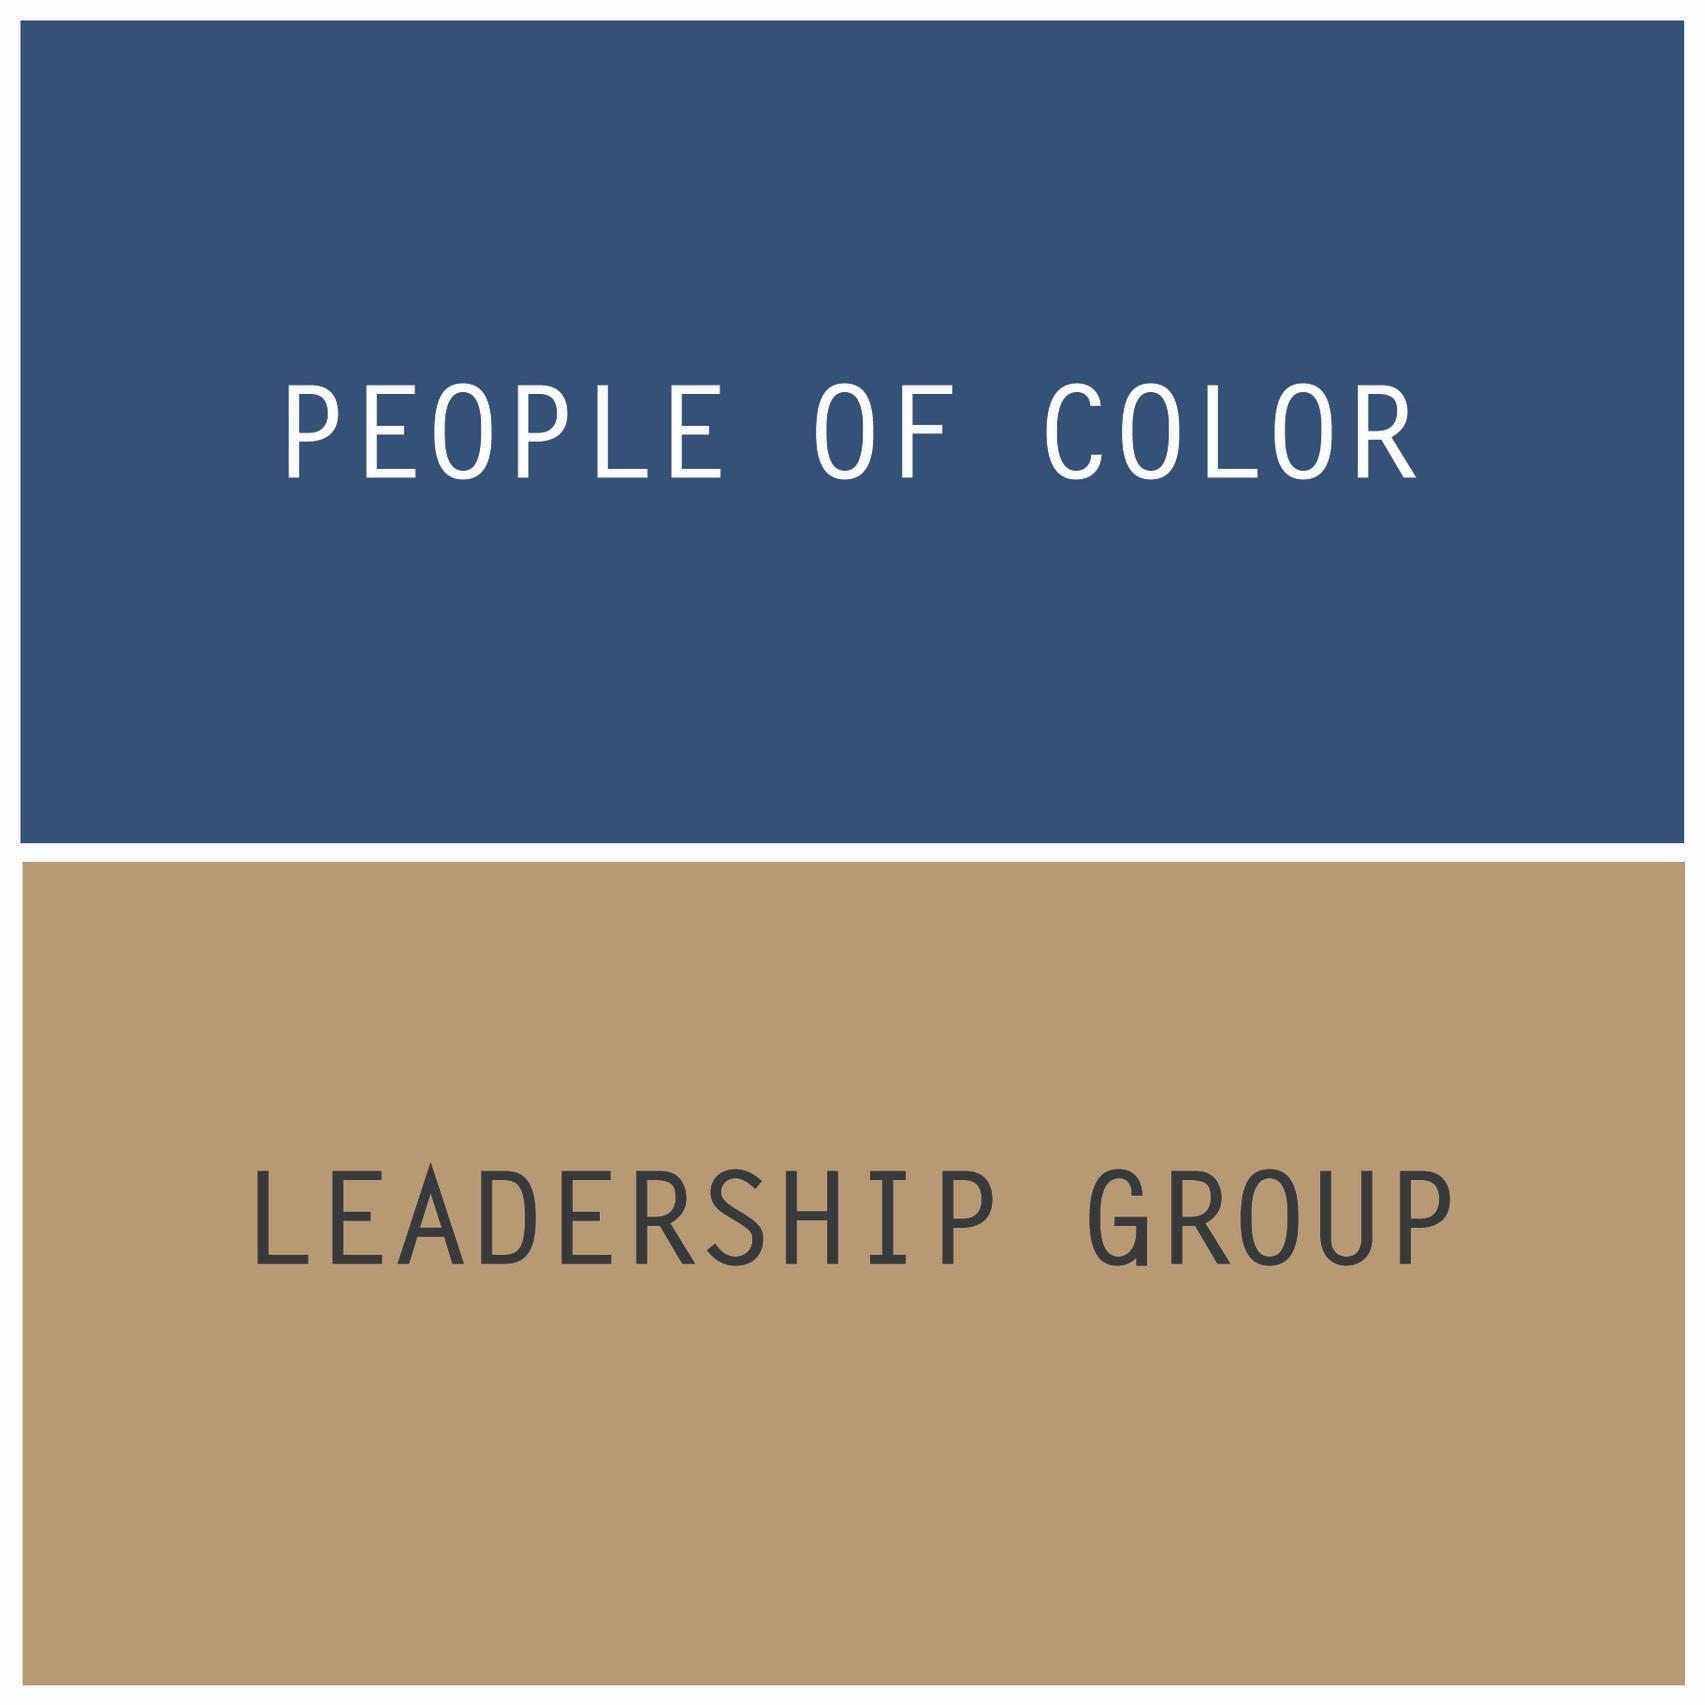 LeadershipGroups2.jpg